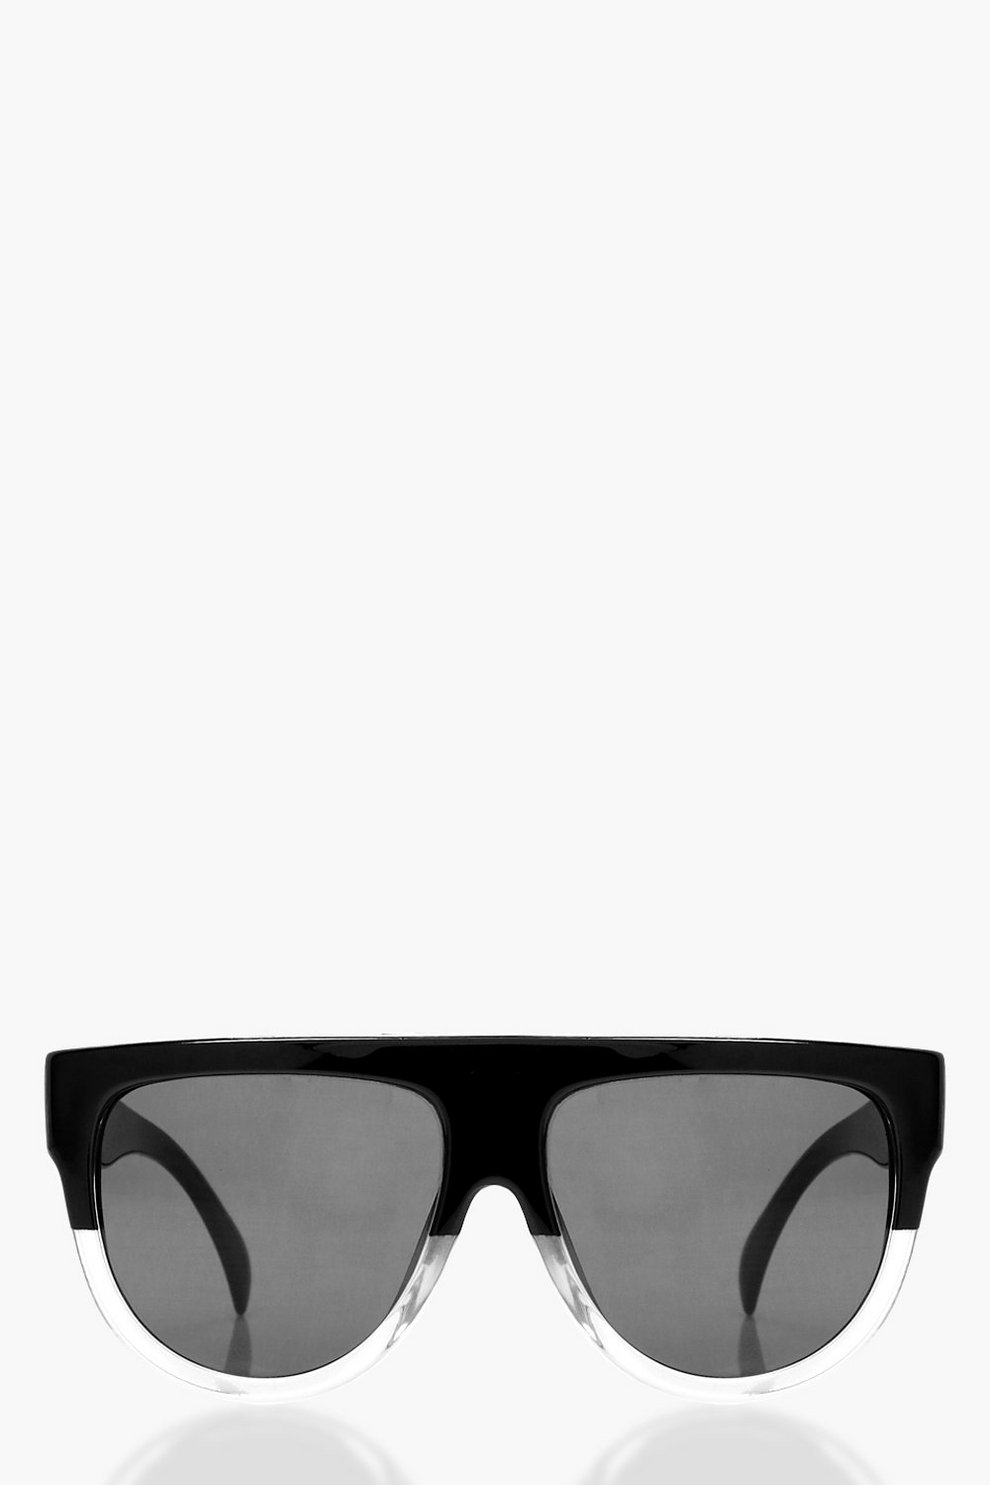 Leah Flat Frame Contrast Sunglasses | Boohoo